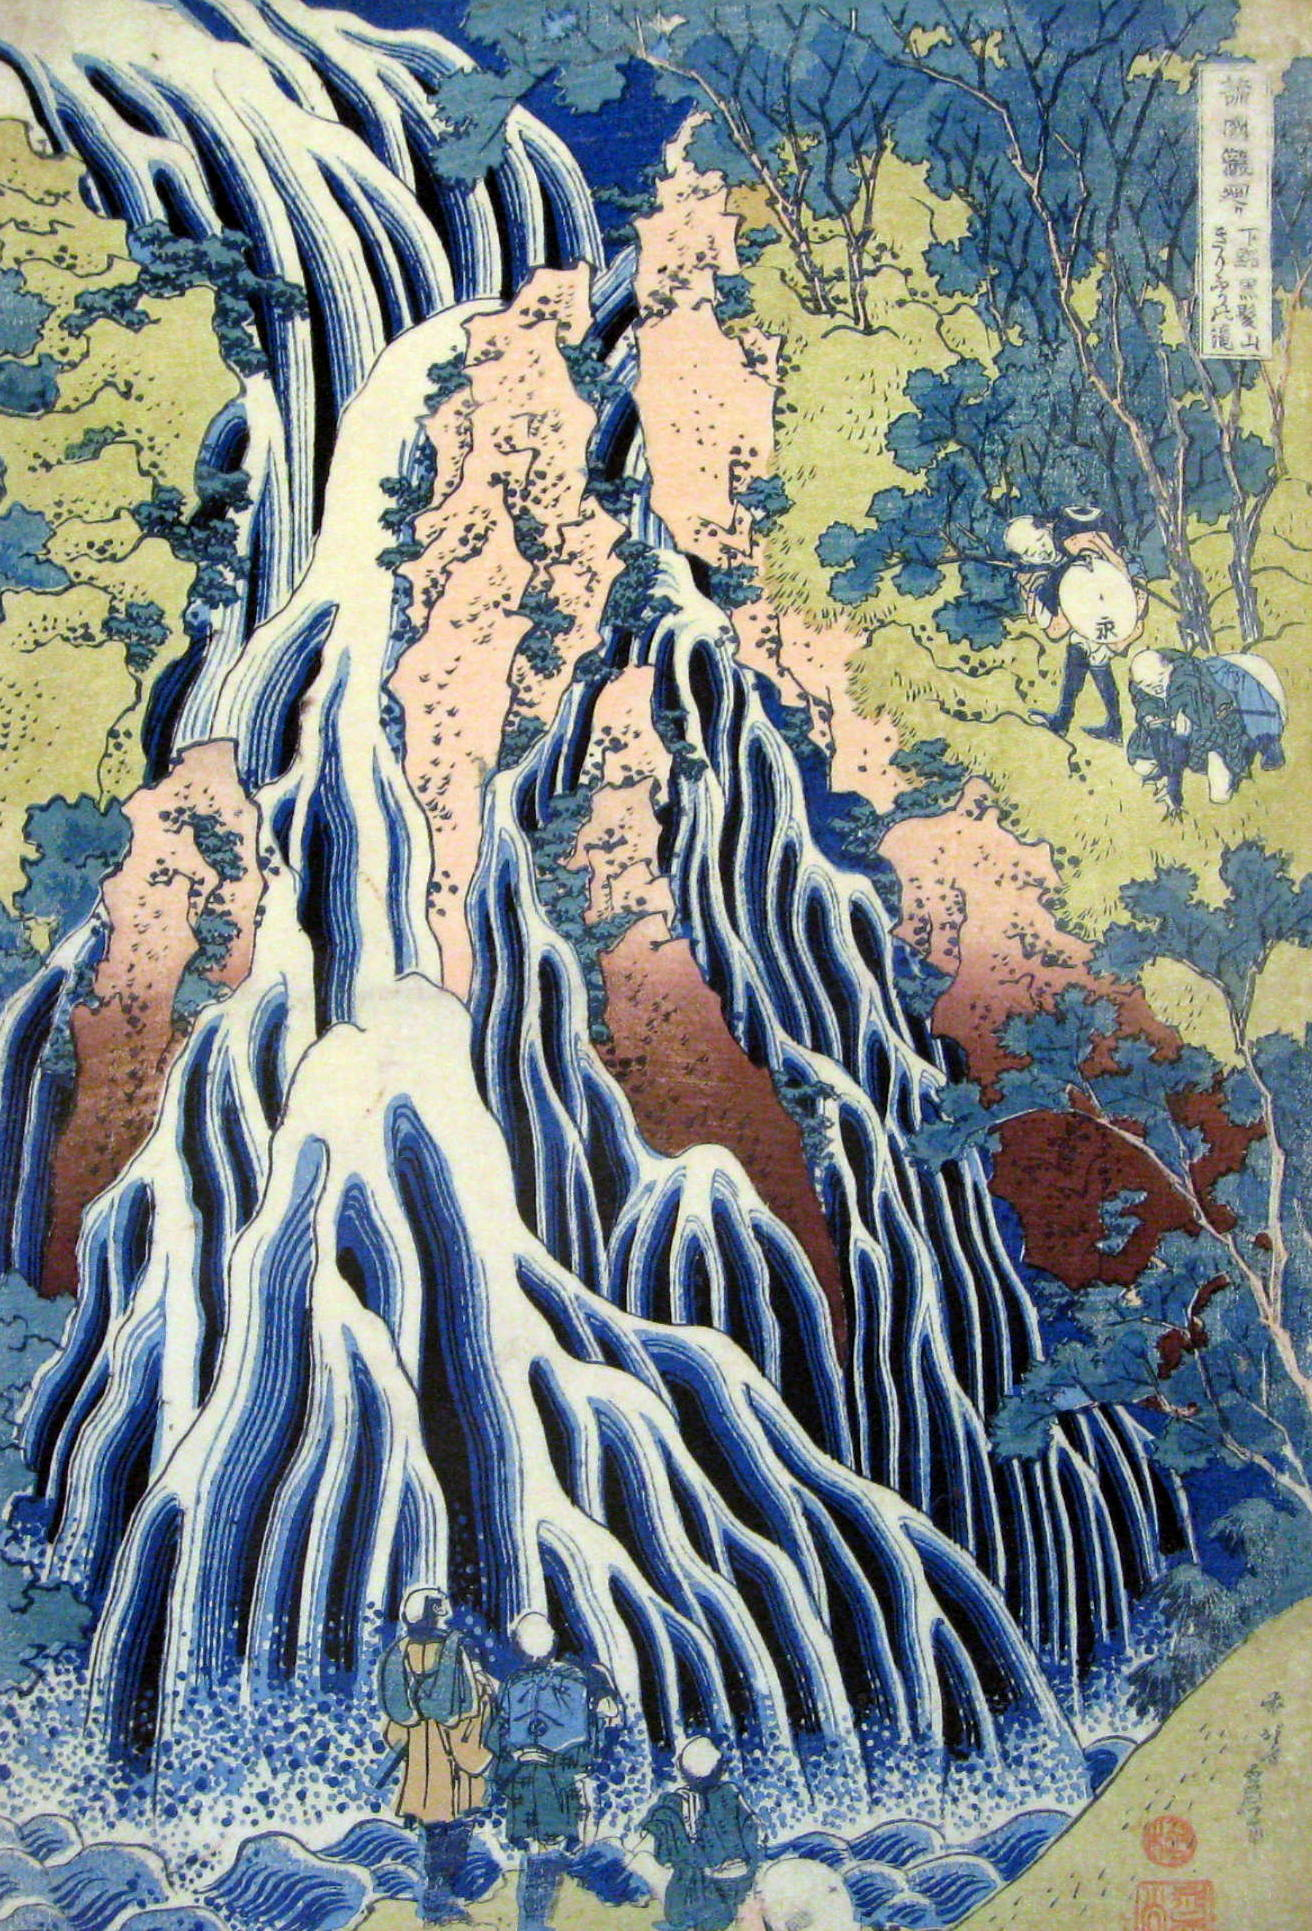 """The Falling Mist Waterfall at Mount Kurokami in Shimotsuke Province"" by Katsushika Hokusai (1760-1849)"